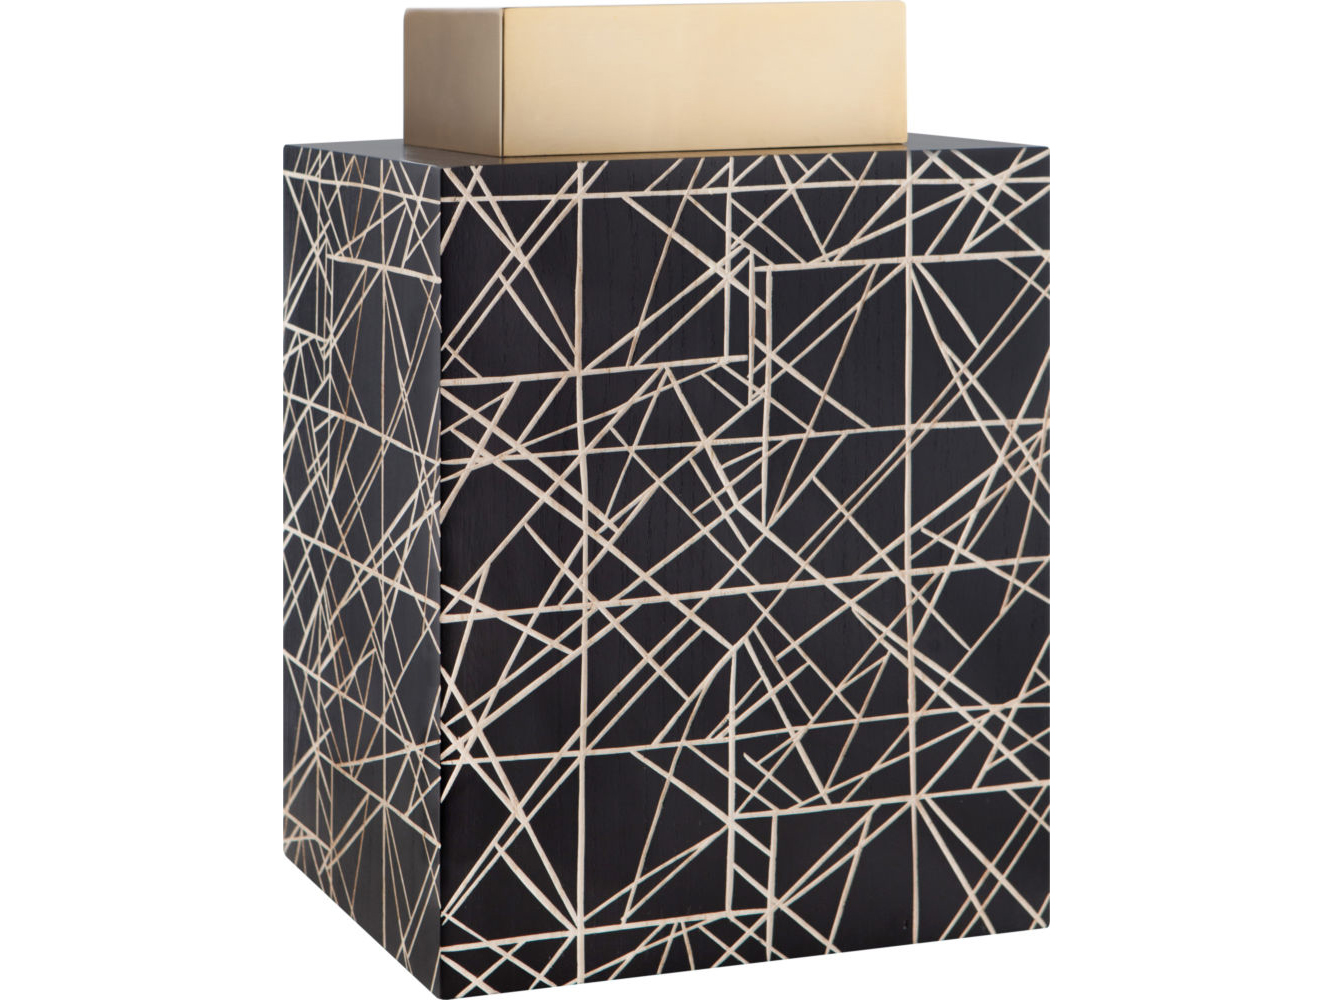 Декоративная ваза M-Style 15439514 от thefurnish